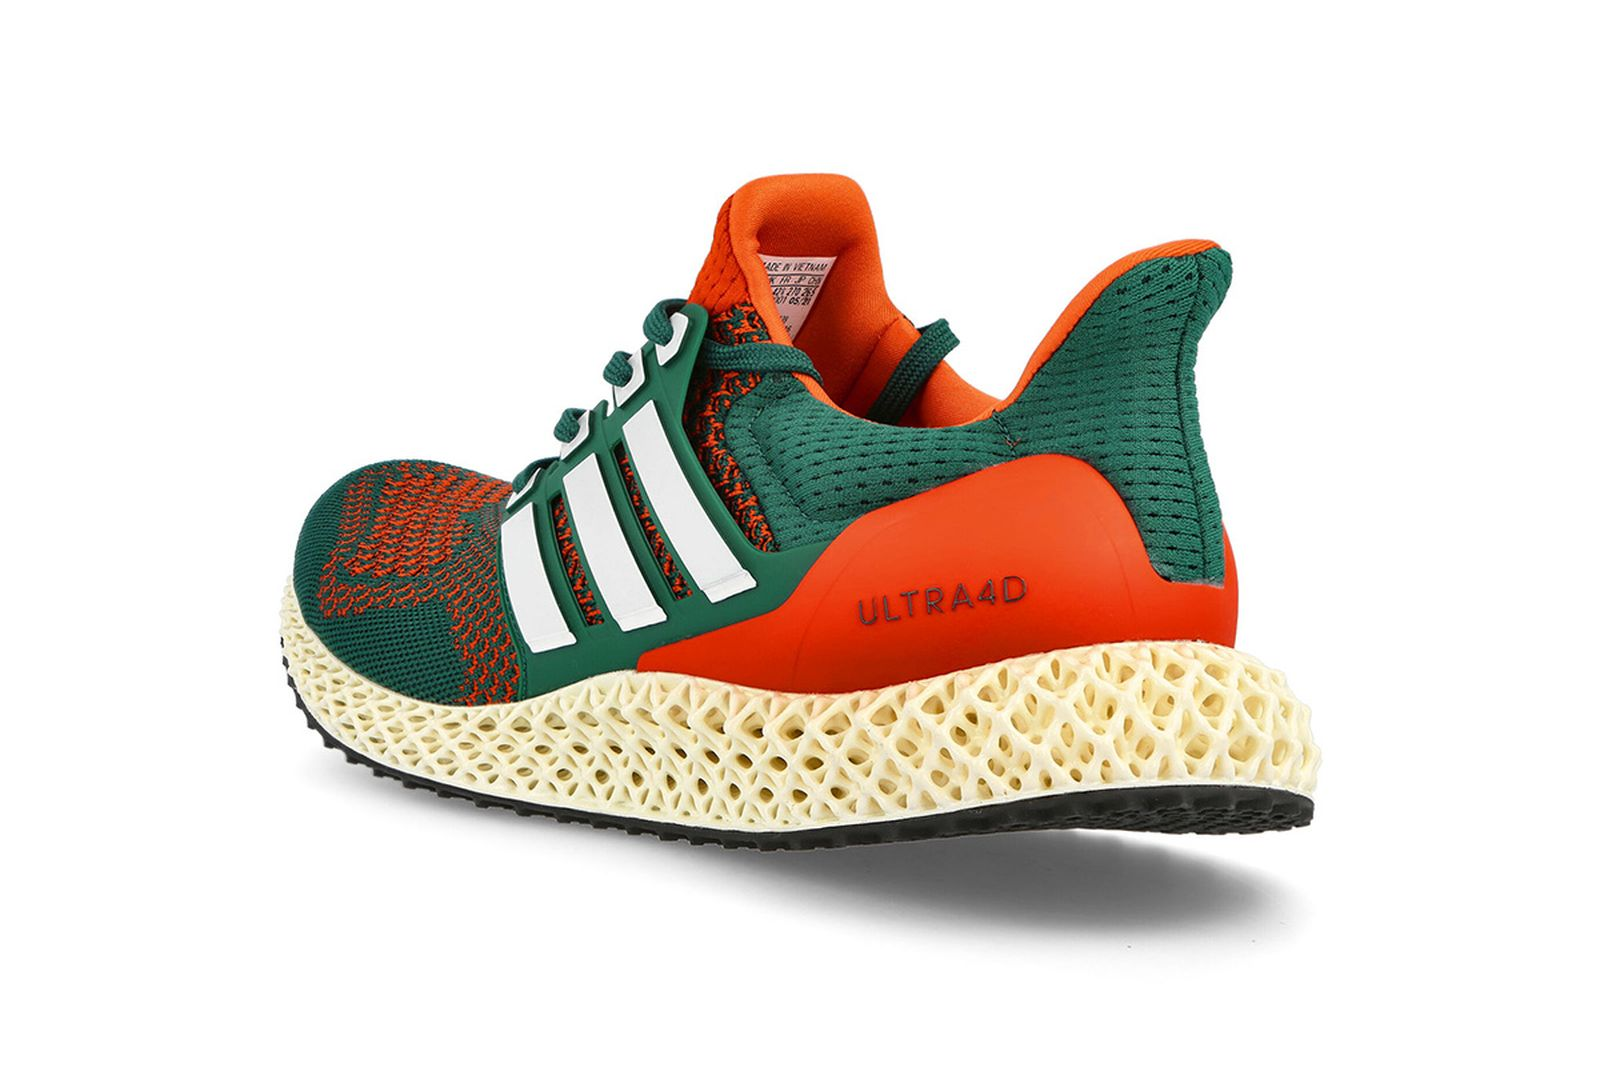 adidas-ultra4d-miami-release-date-price-04